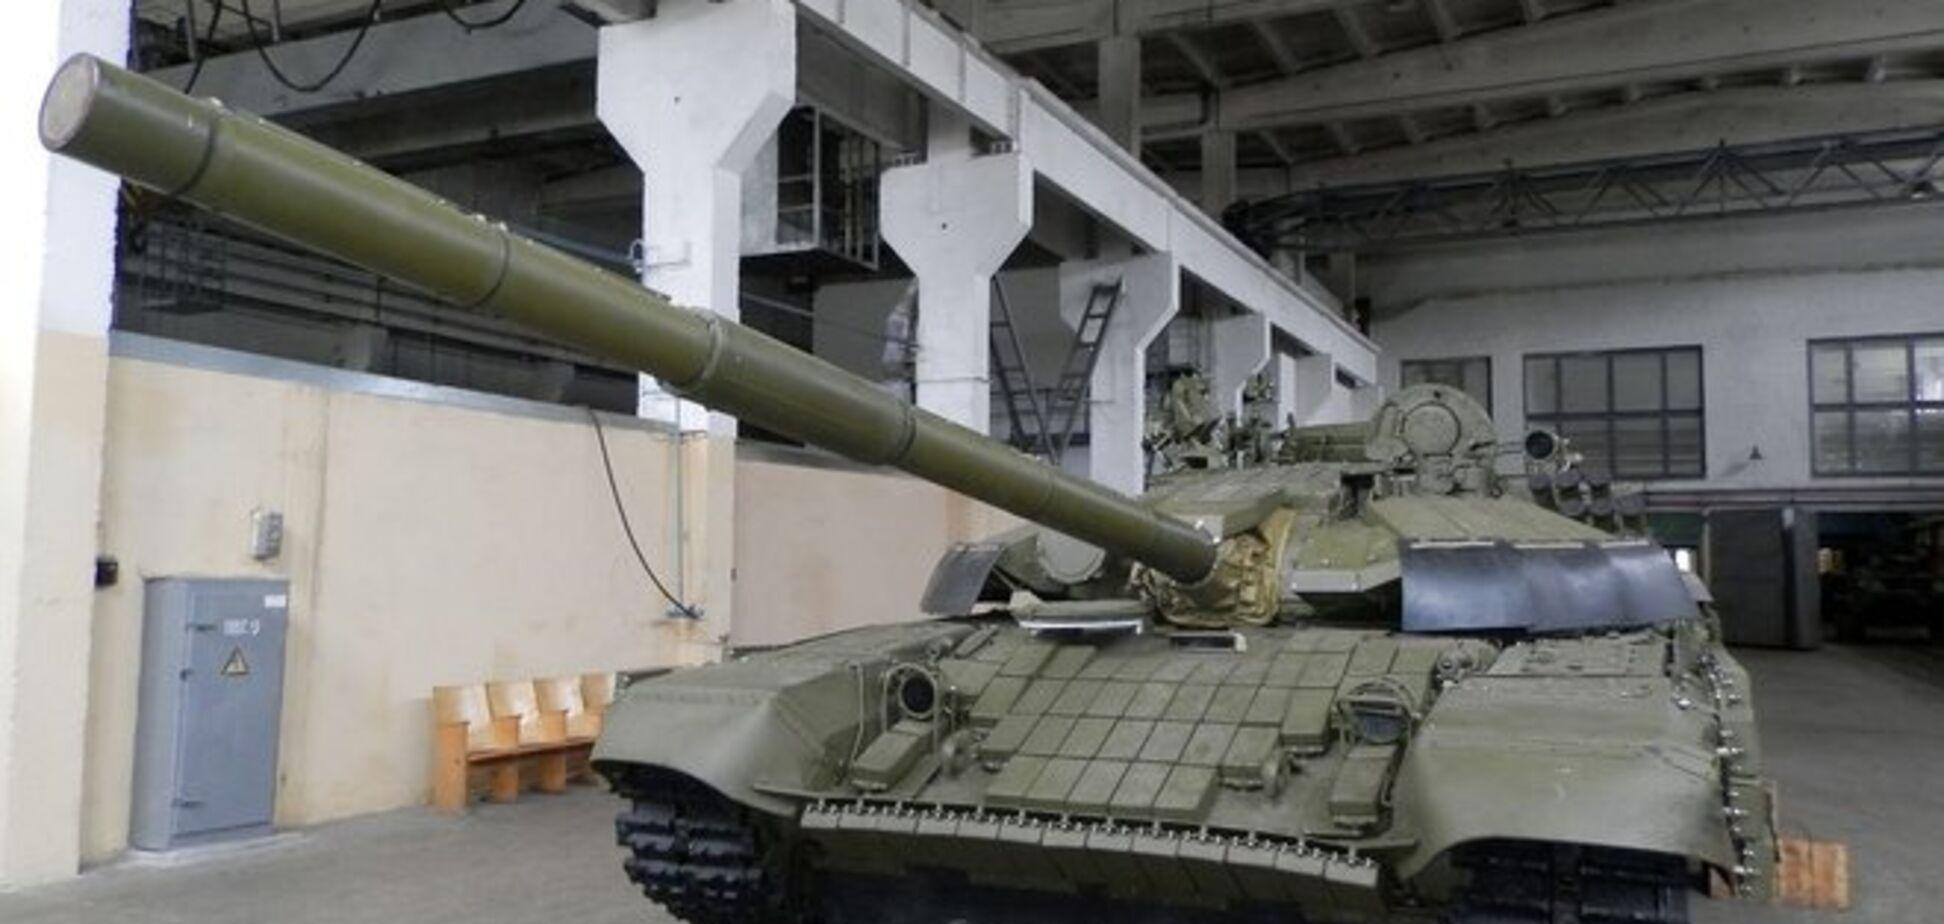 На Киевском бронетанковом заводе вместо ремонта танки разбирали на детали и продавали